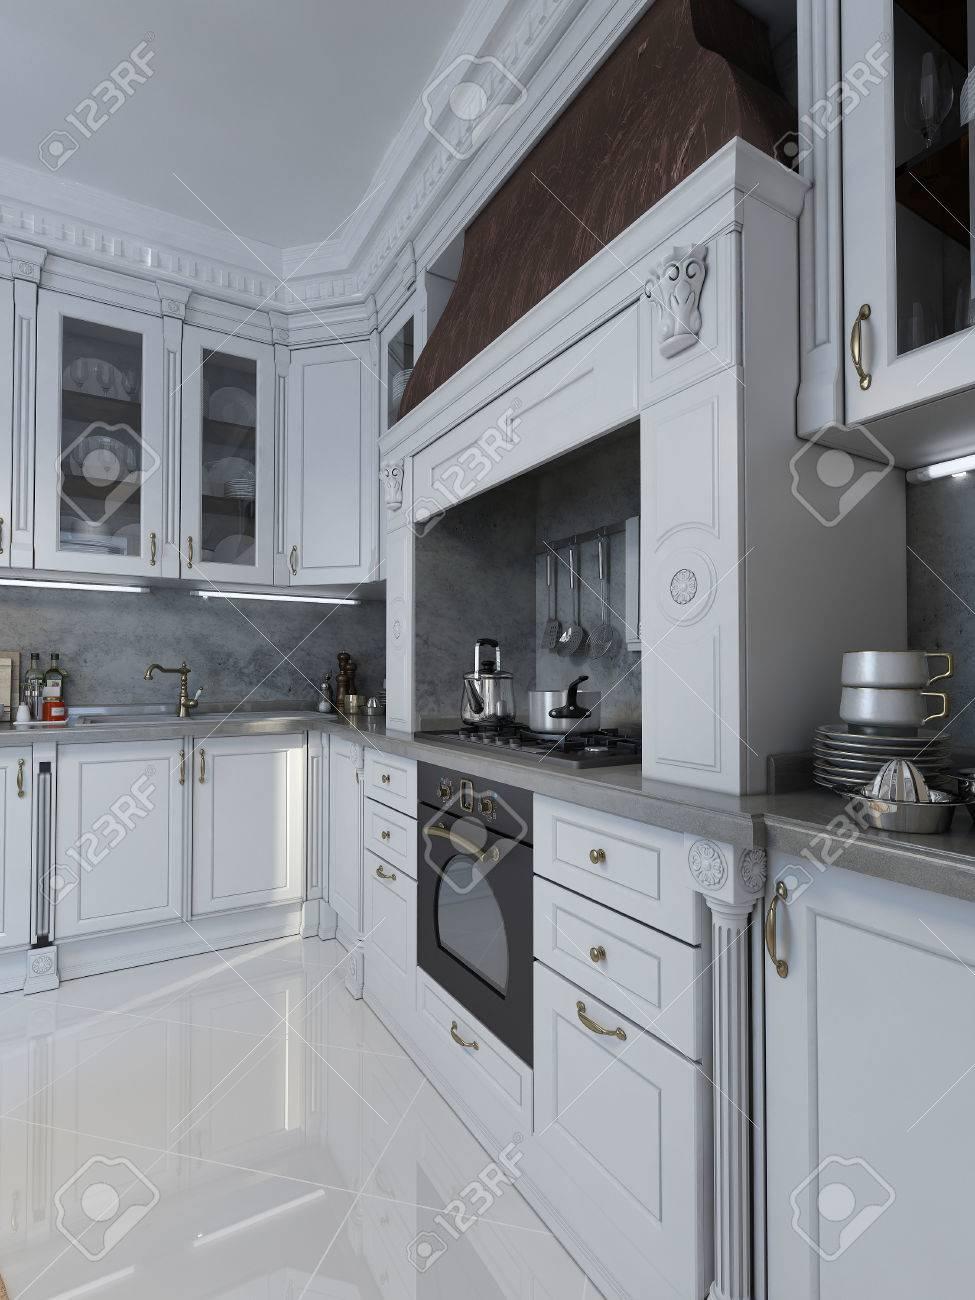 Funky Neo Kitchen Elaboration - Kitchen Cabinets   Ideas ...